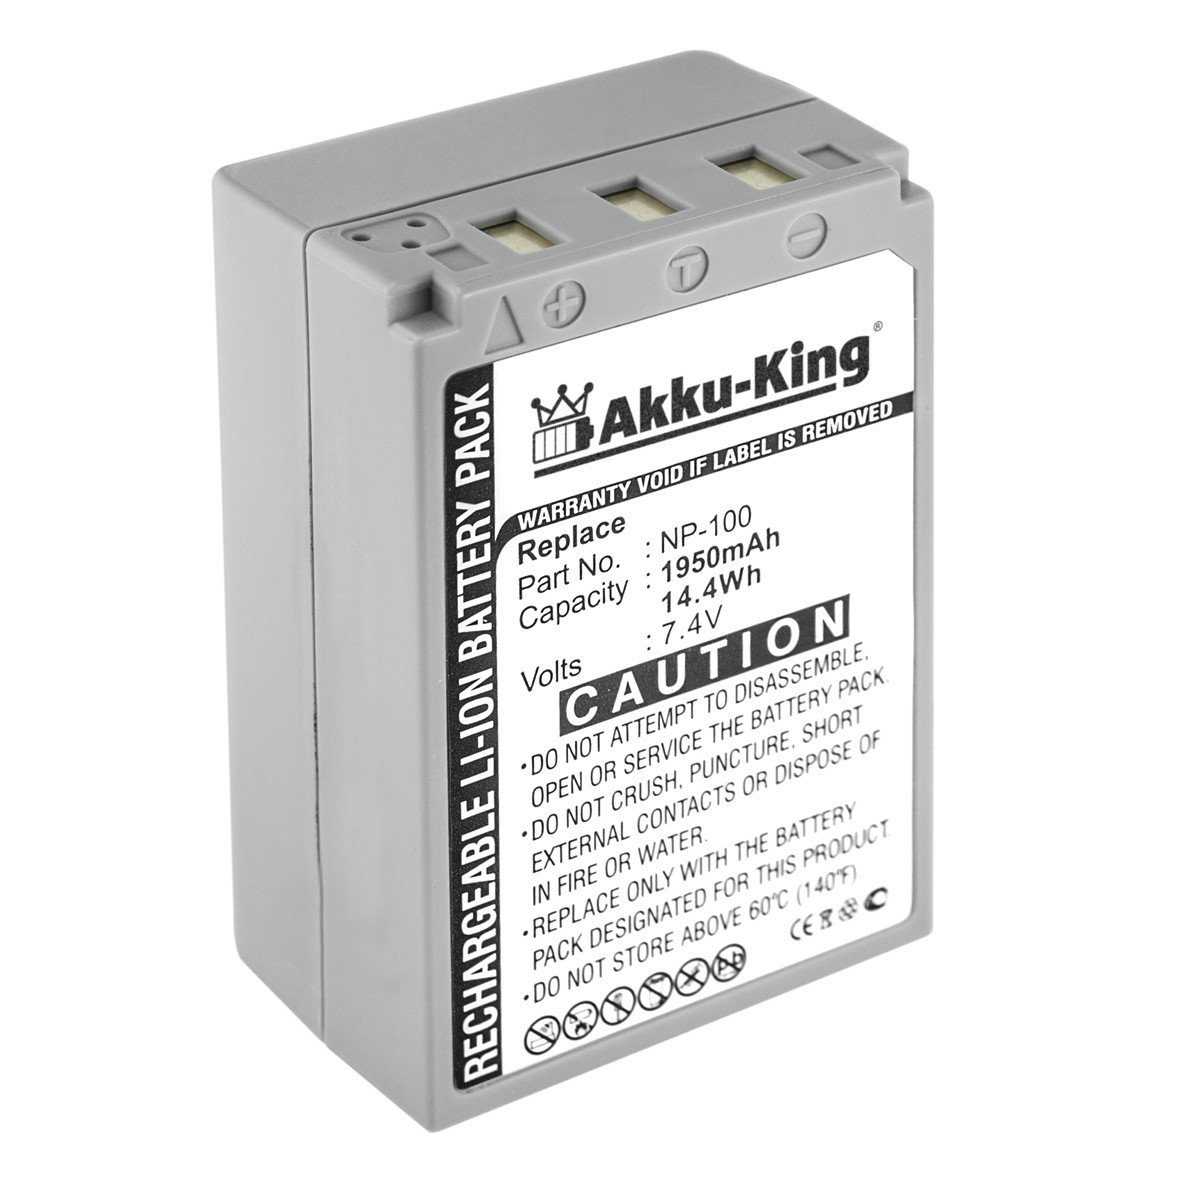 Bateria f BenQ dc-e43 dc-e53 dc-e720 Jenoptik JD 12.0z3 SL